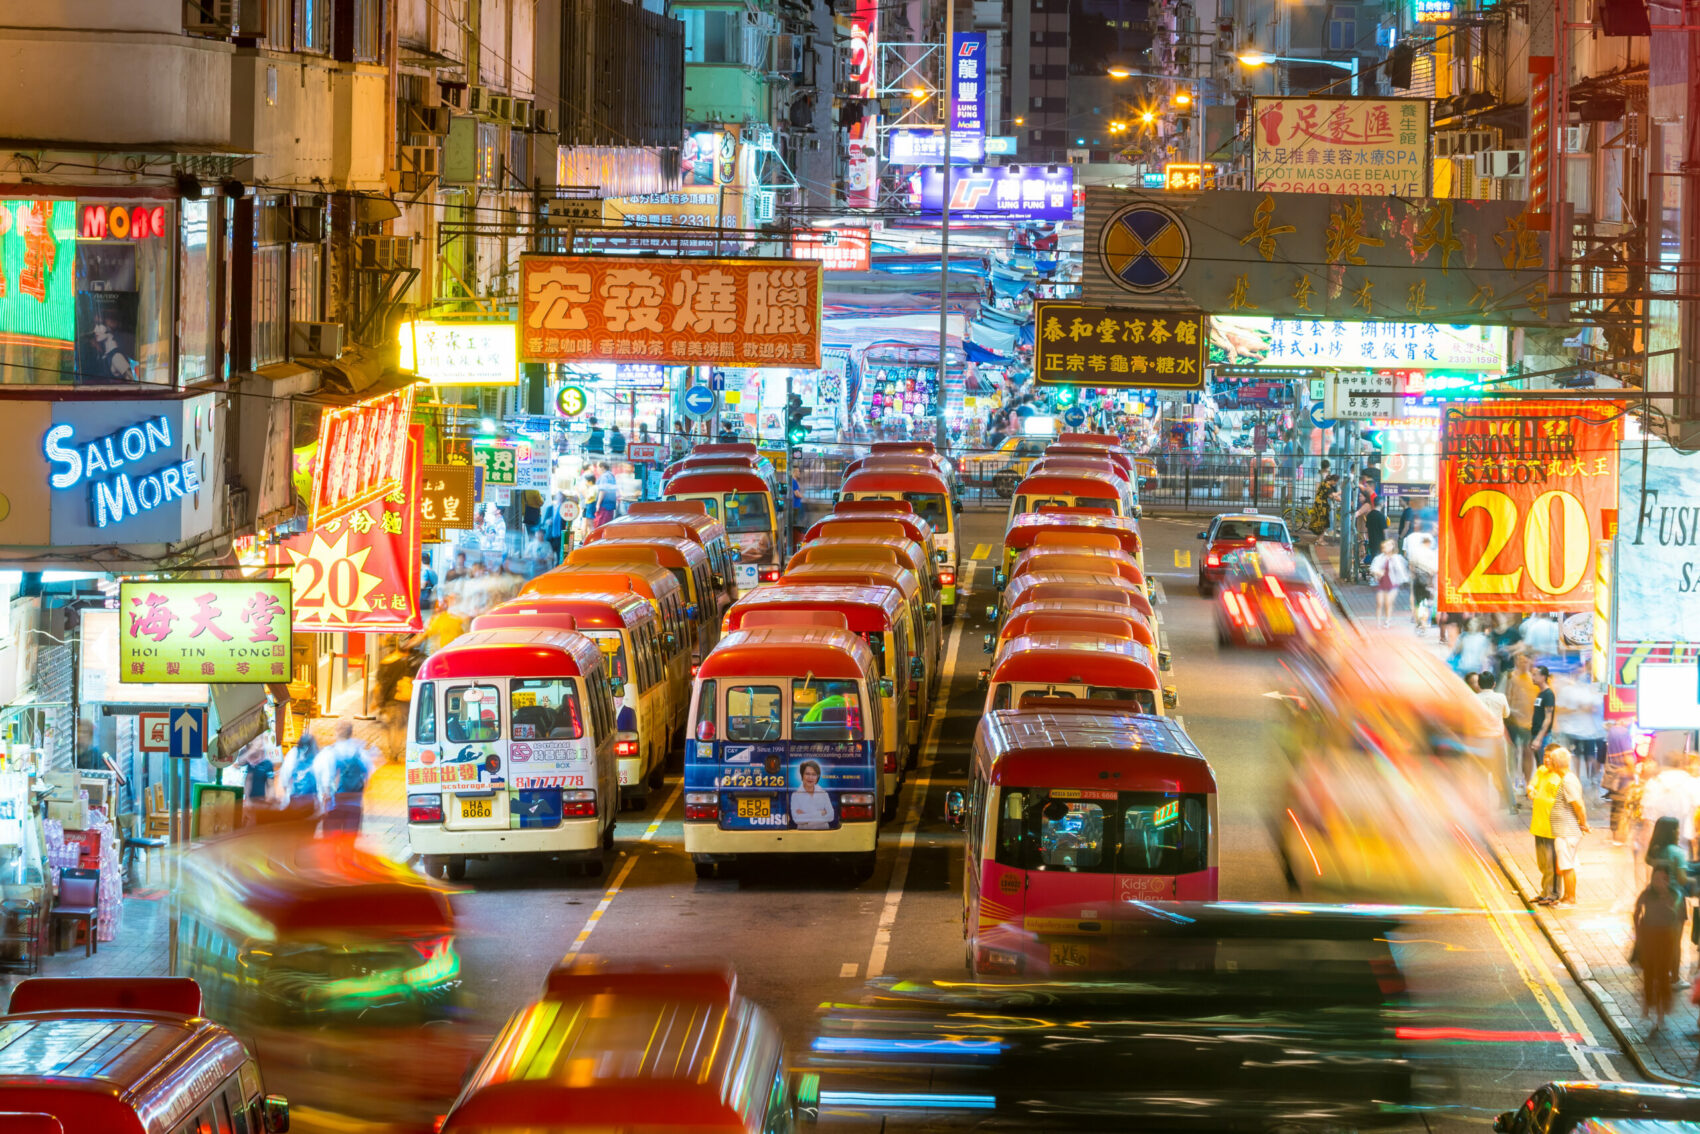 Neon lights in Mong Kok, Hong Kong